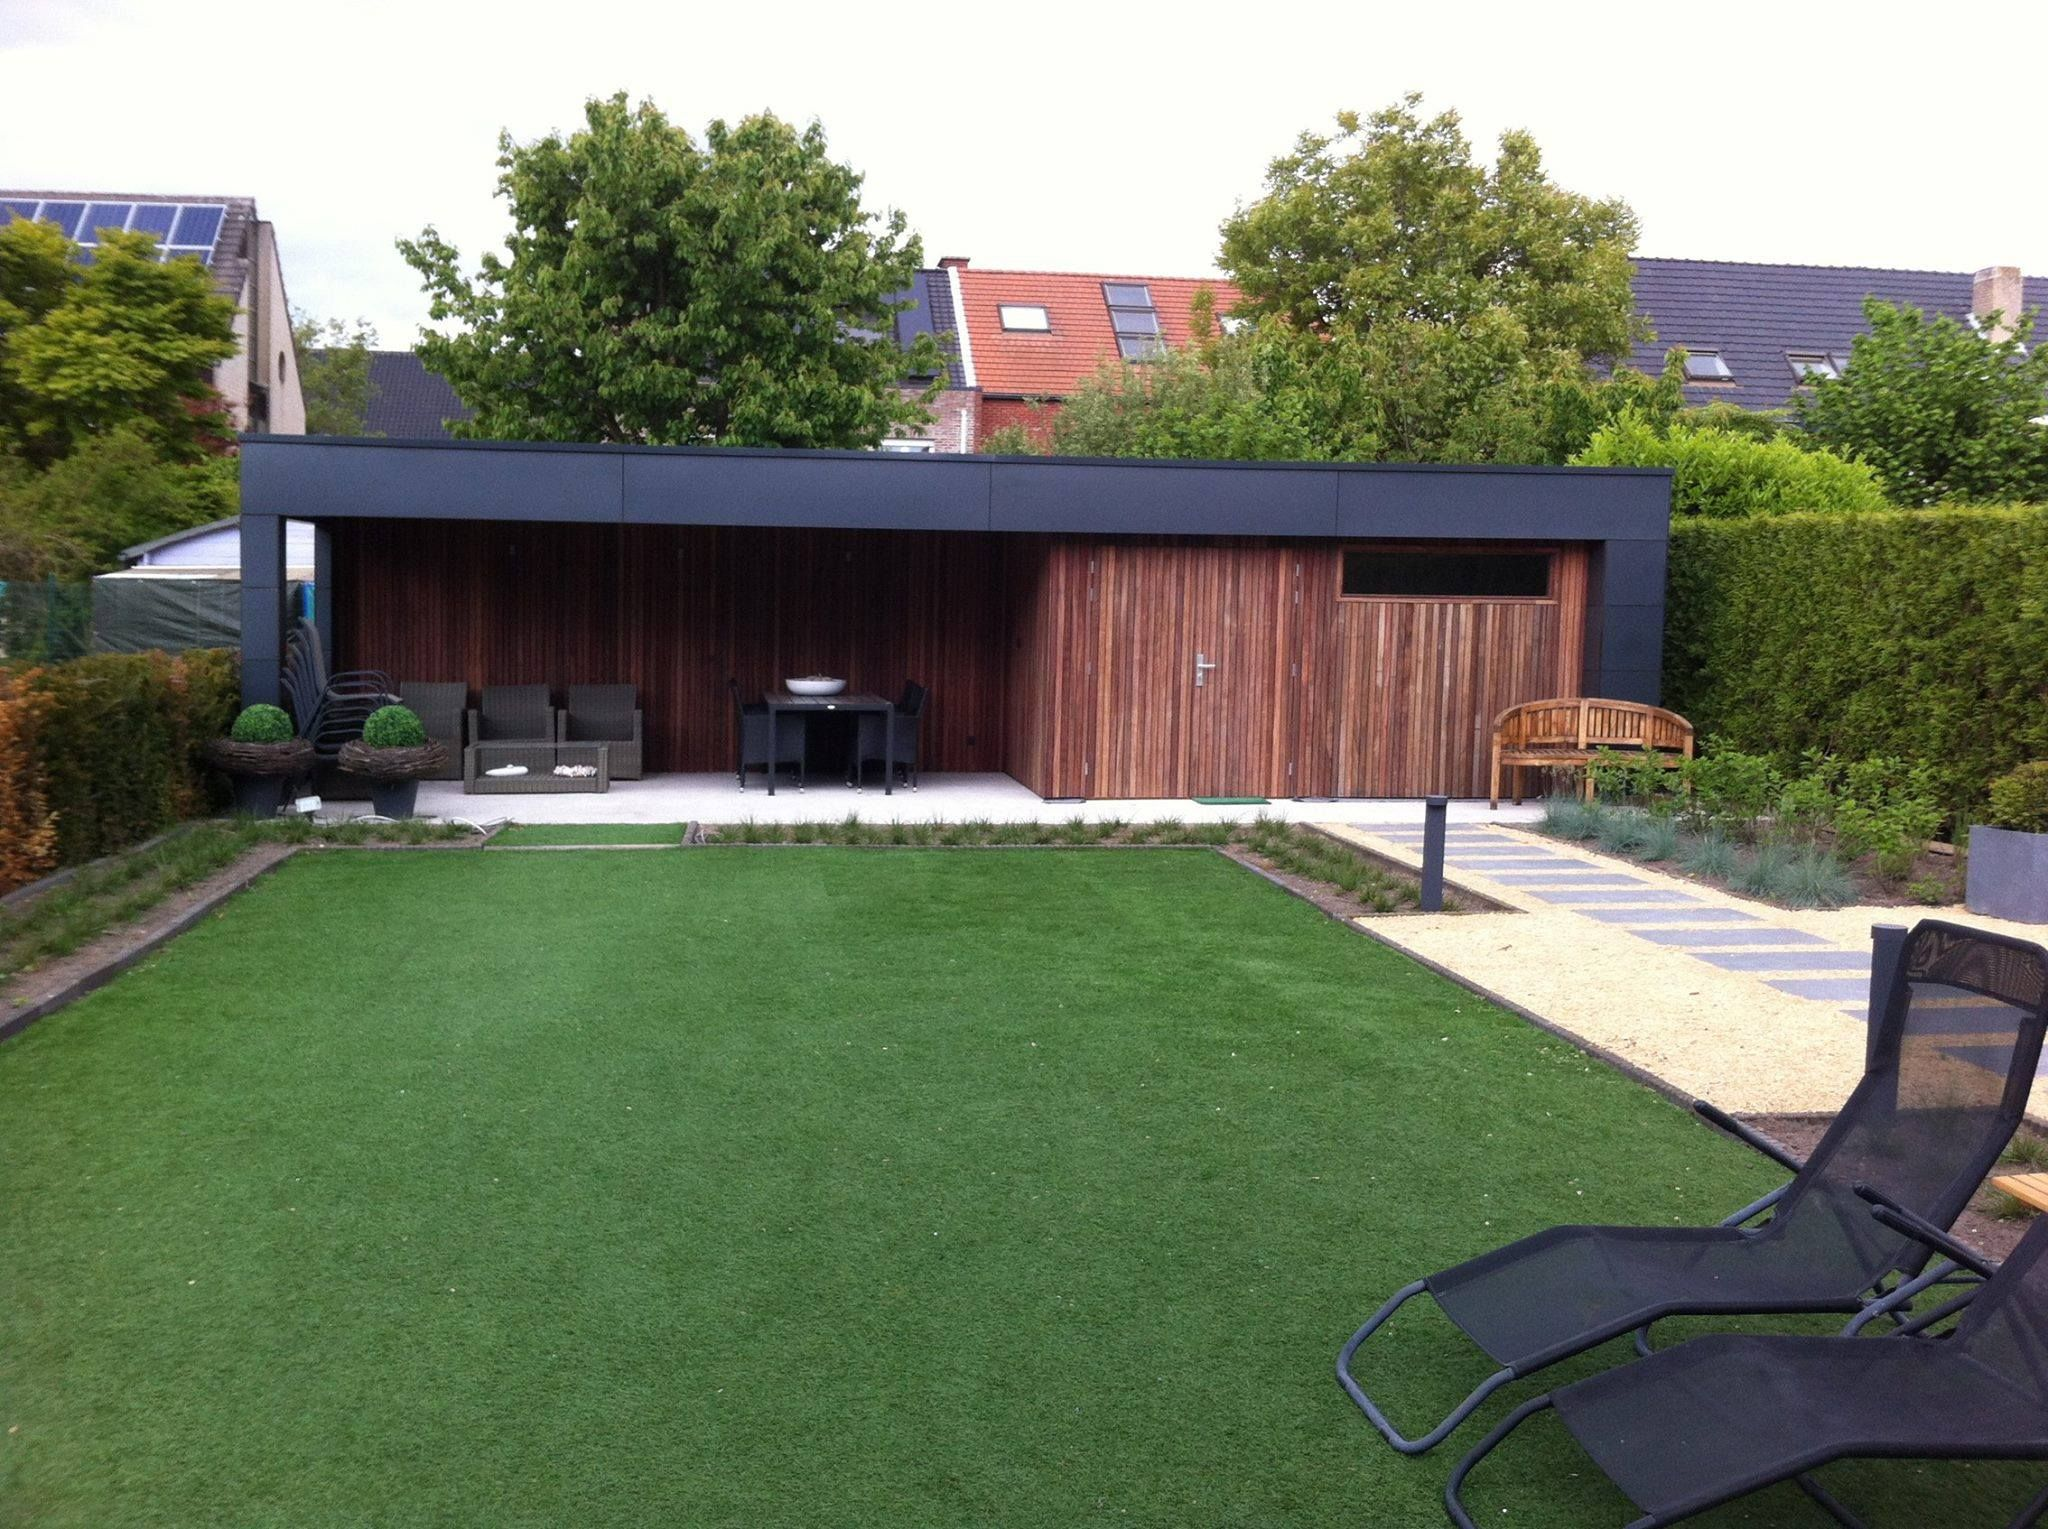 Modern tuinhuis met overdekt terras google zoeken huis pinterest tuinhuis terras en modern - Overdekt terras in hout ...